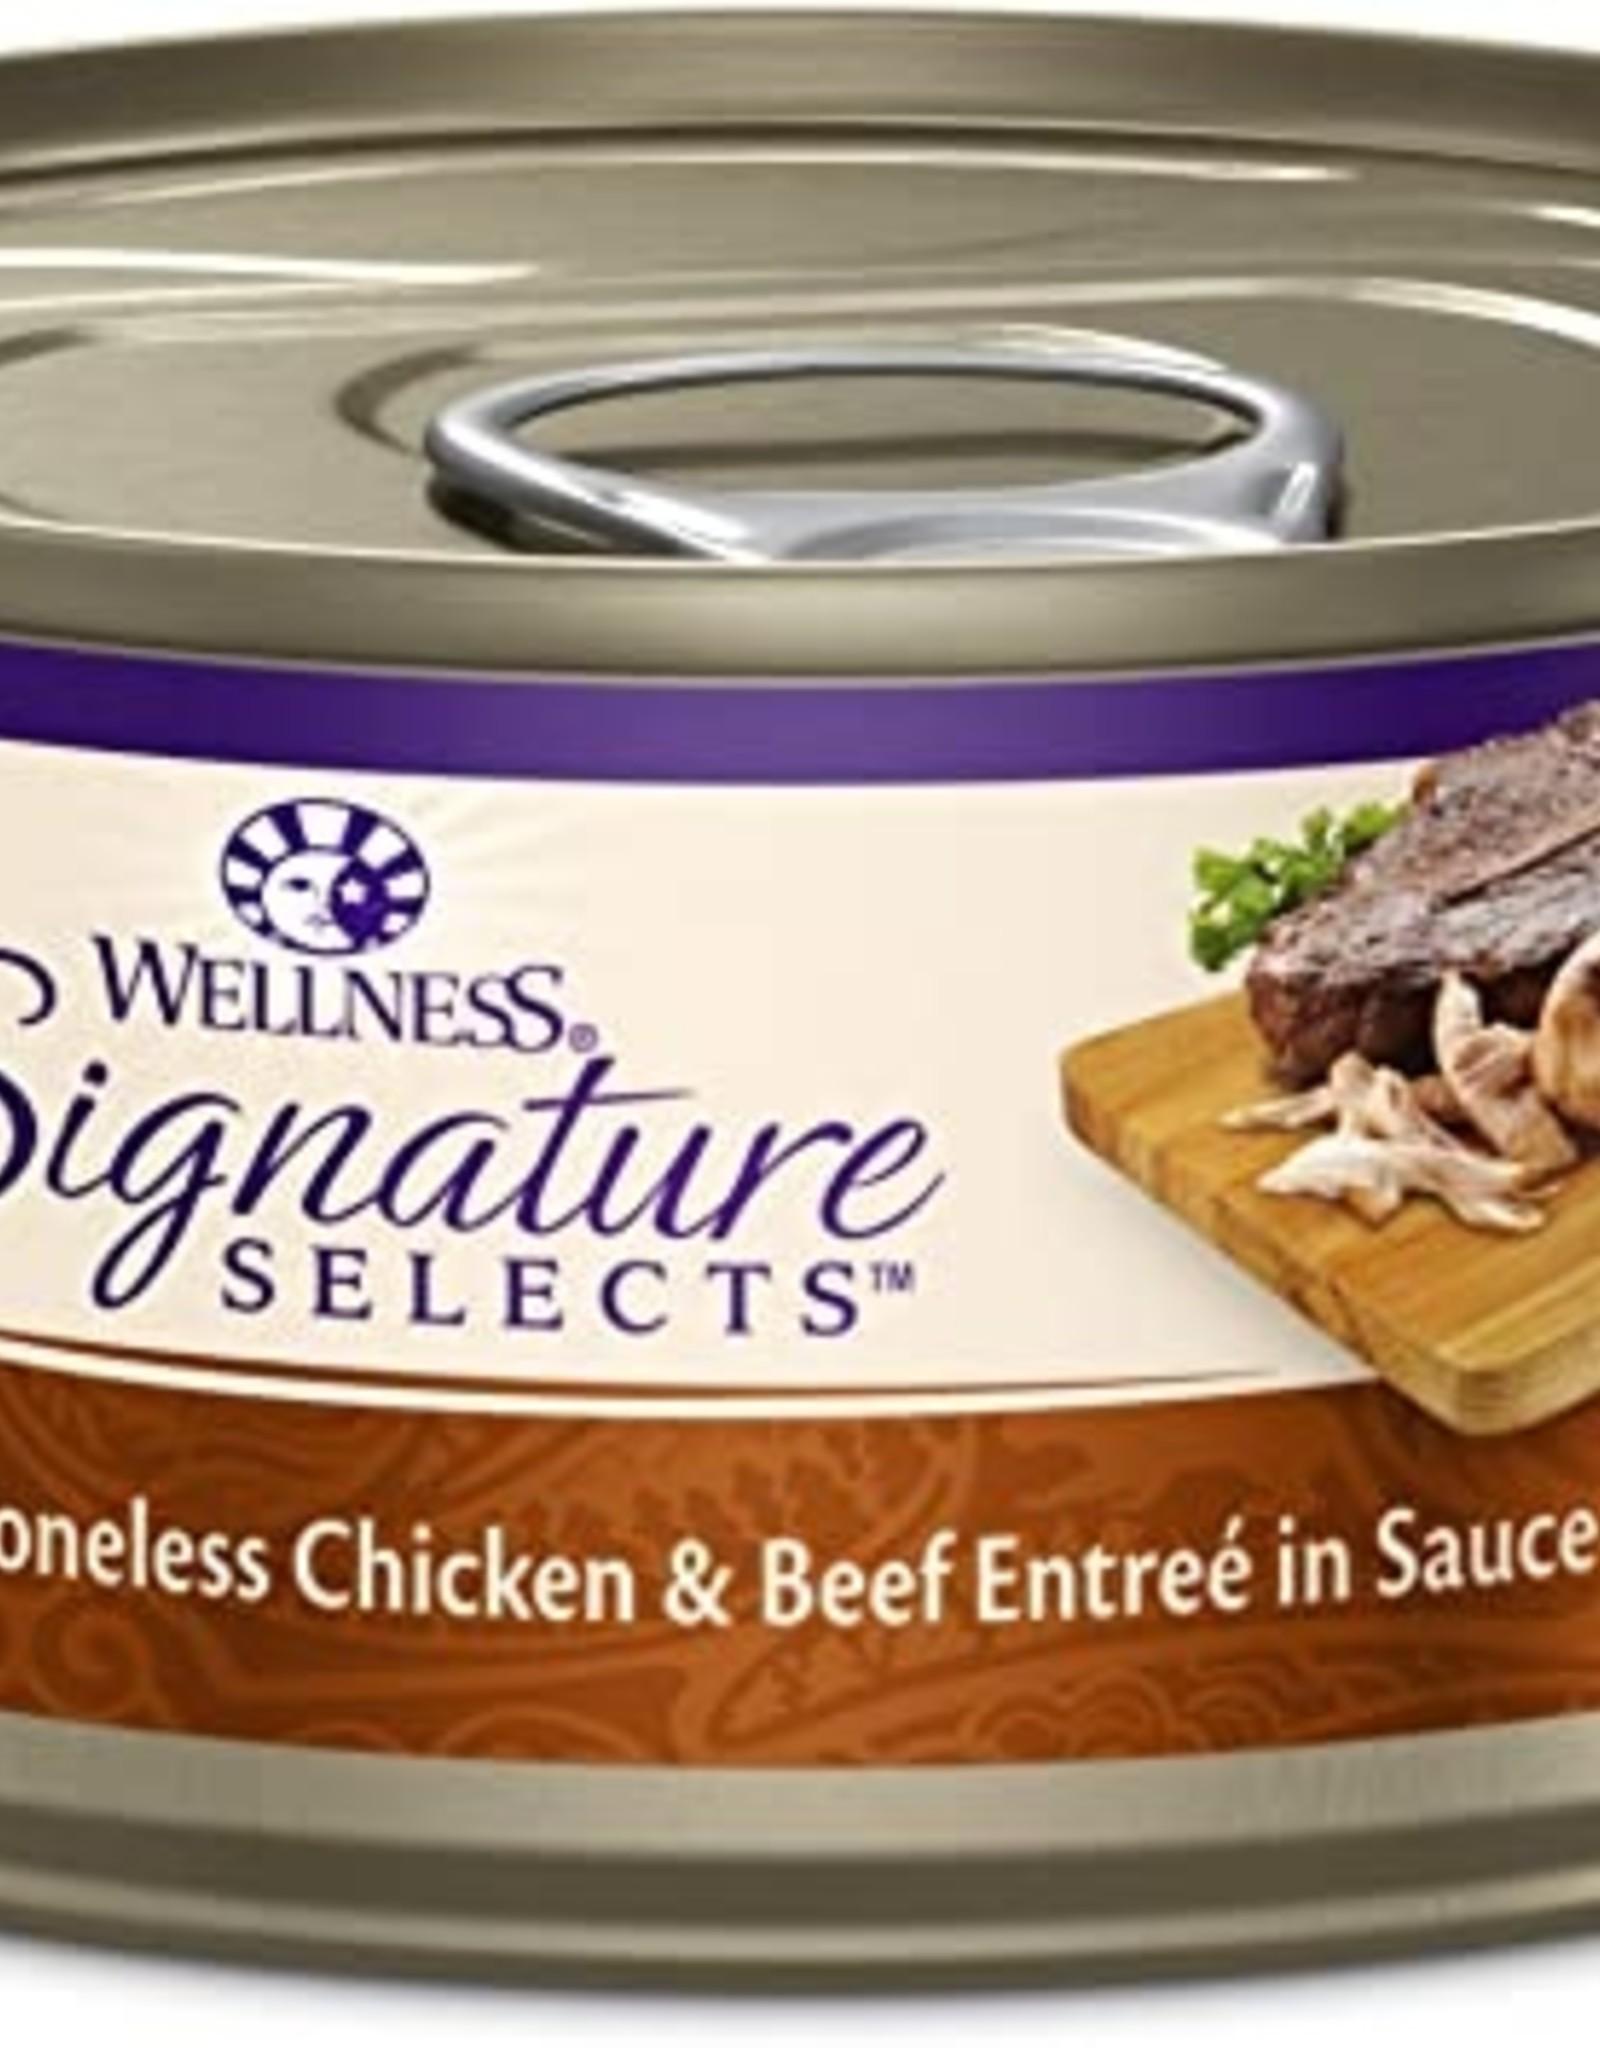 Wellness Pet Food Cat Signature Chicken & Beef Shredded - Grain-Free 5.5oz